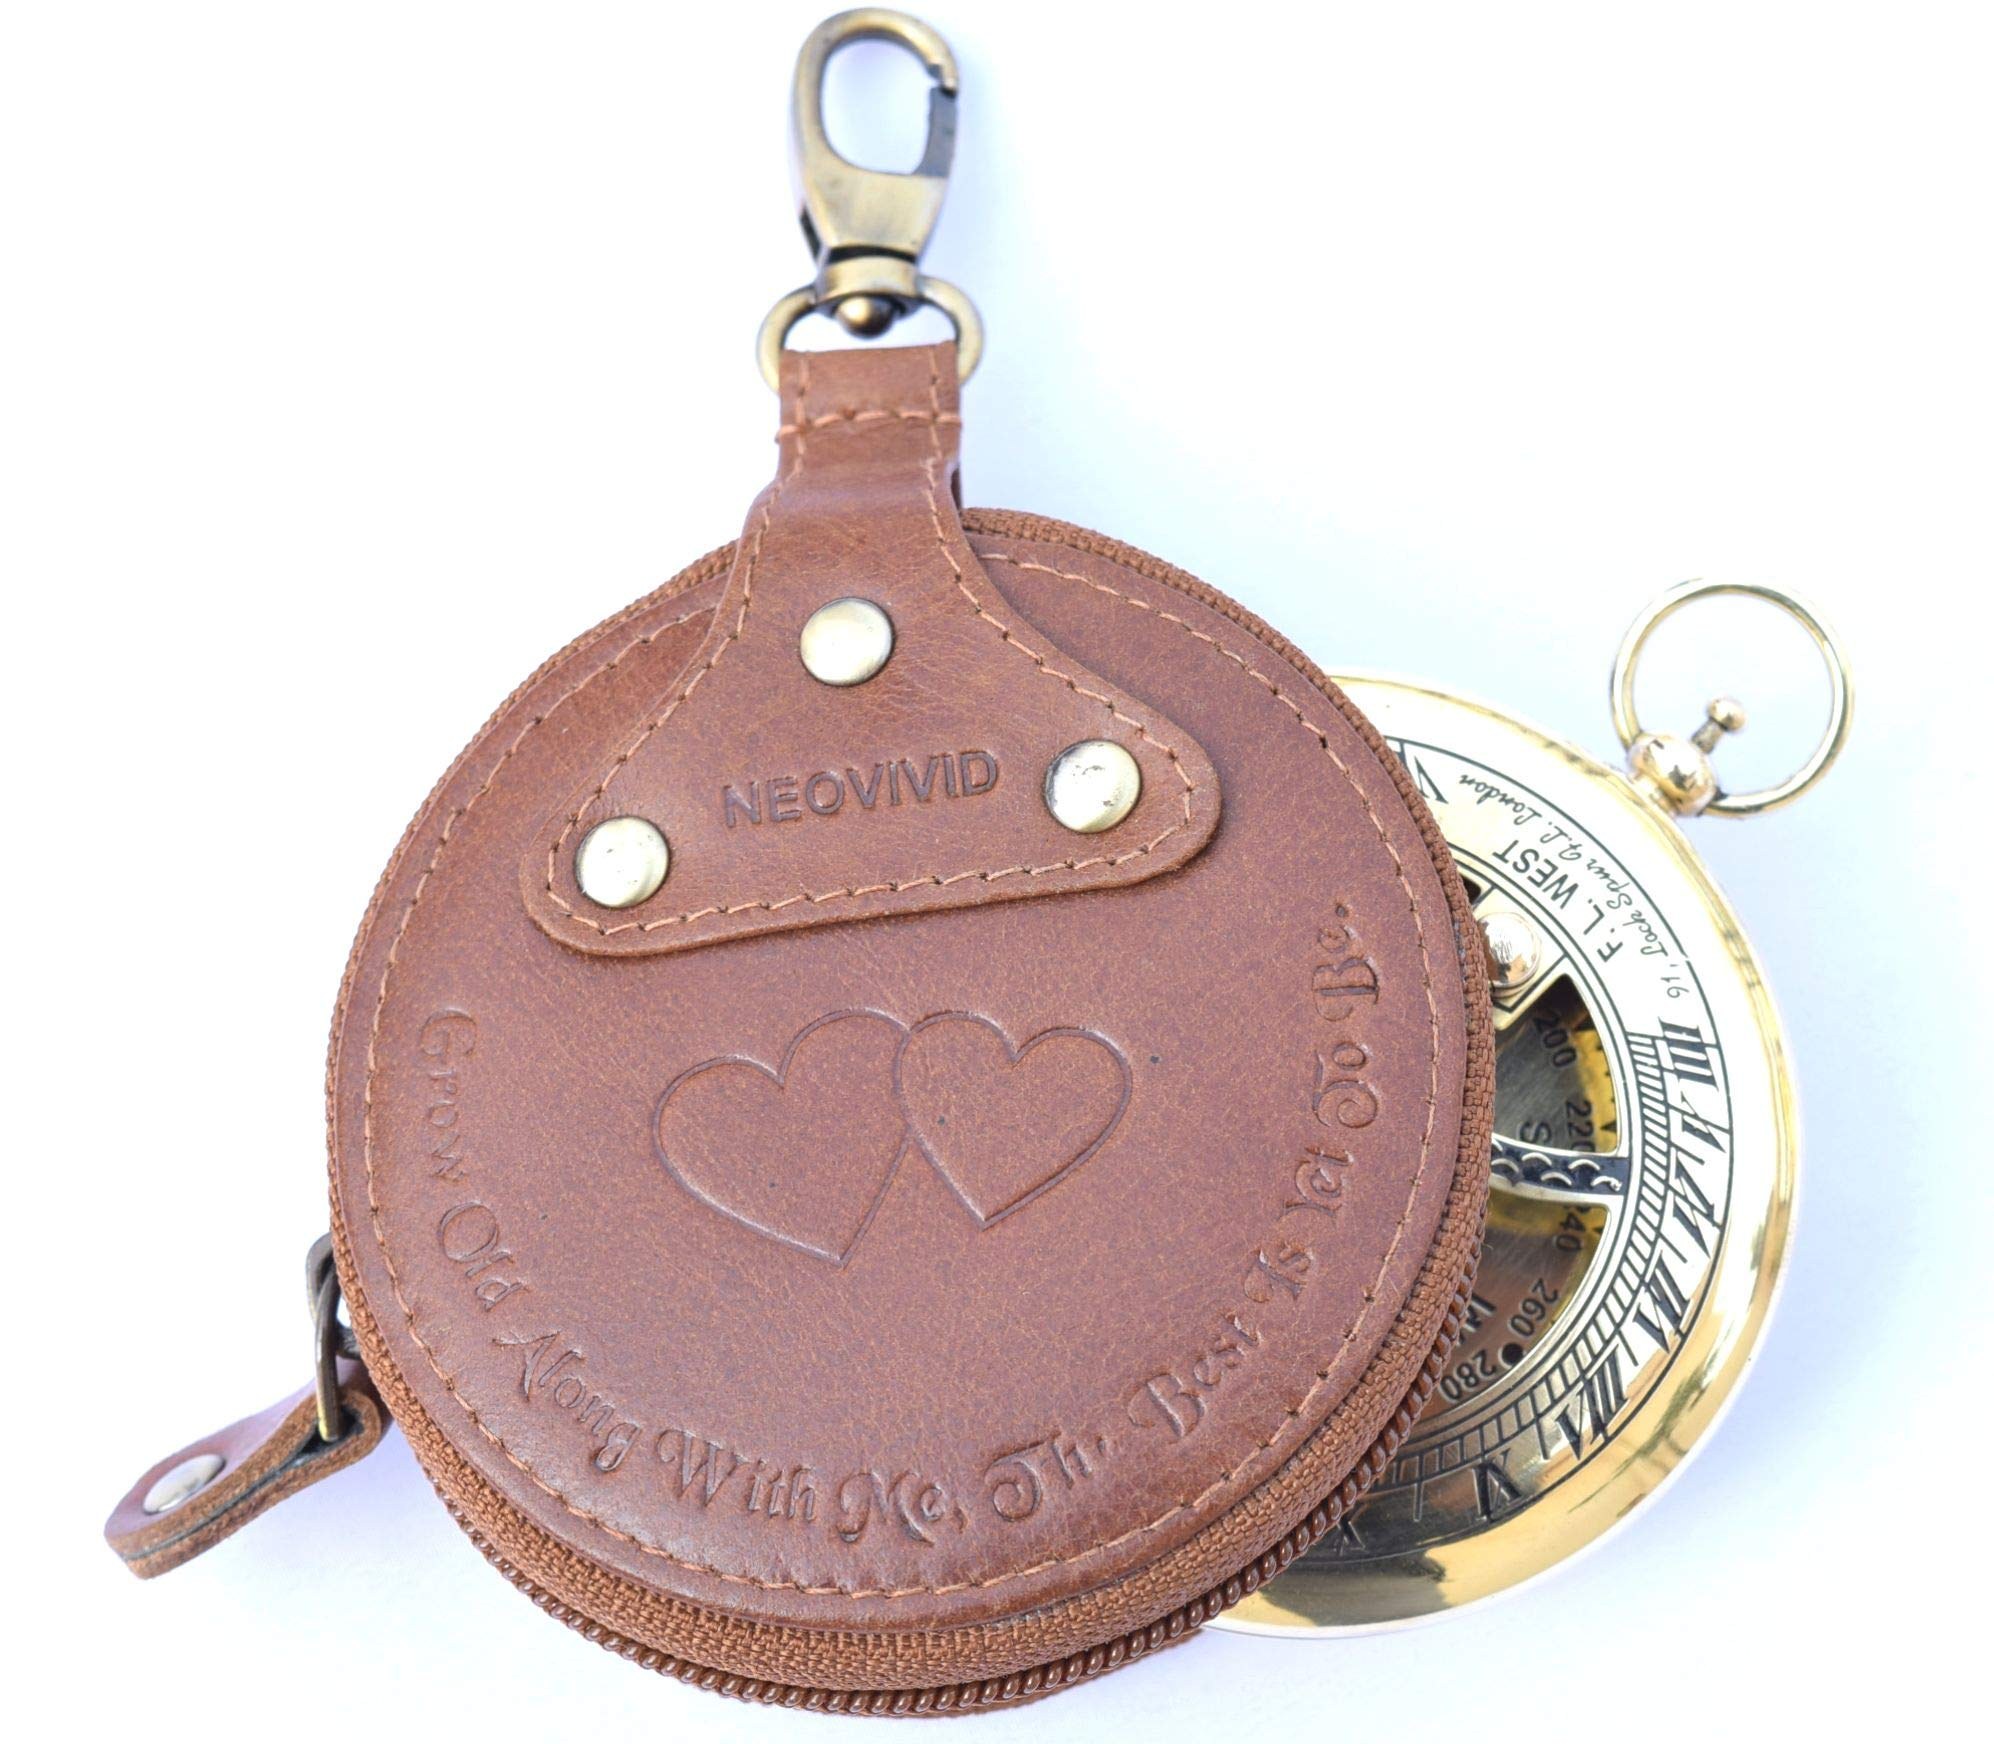 NEOVIVID Grow Old Along with Me Sundial - Sundial Compass - Sundial Clock - Anniversary Sundial Gift - Valentine's Sundial (Brass and Leather) by NEOVIVID